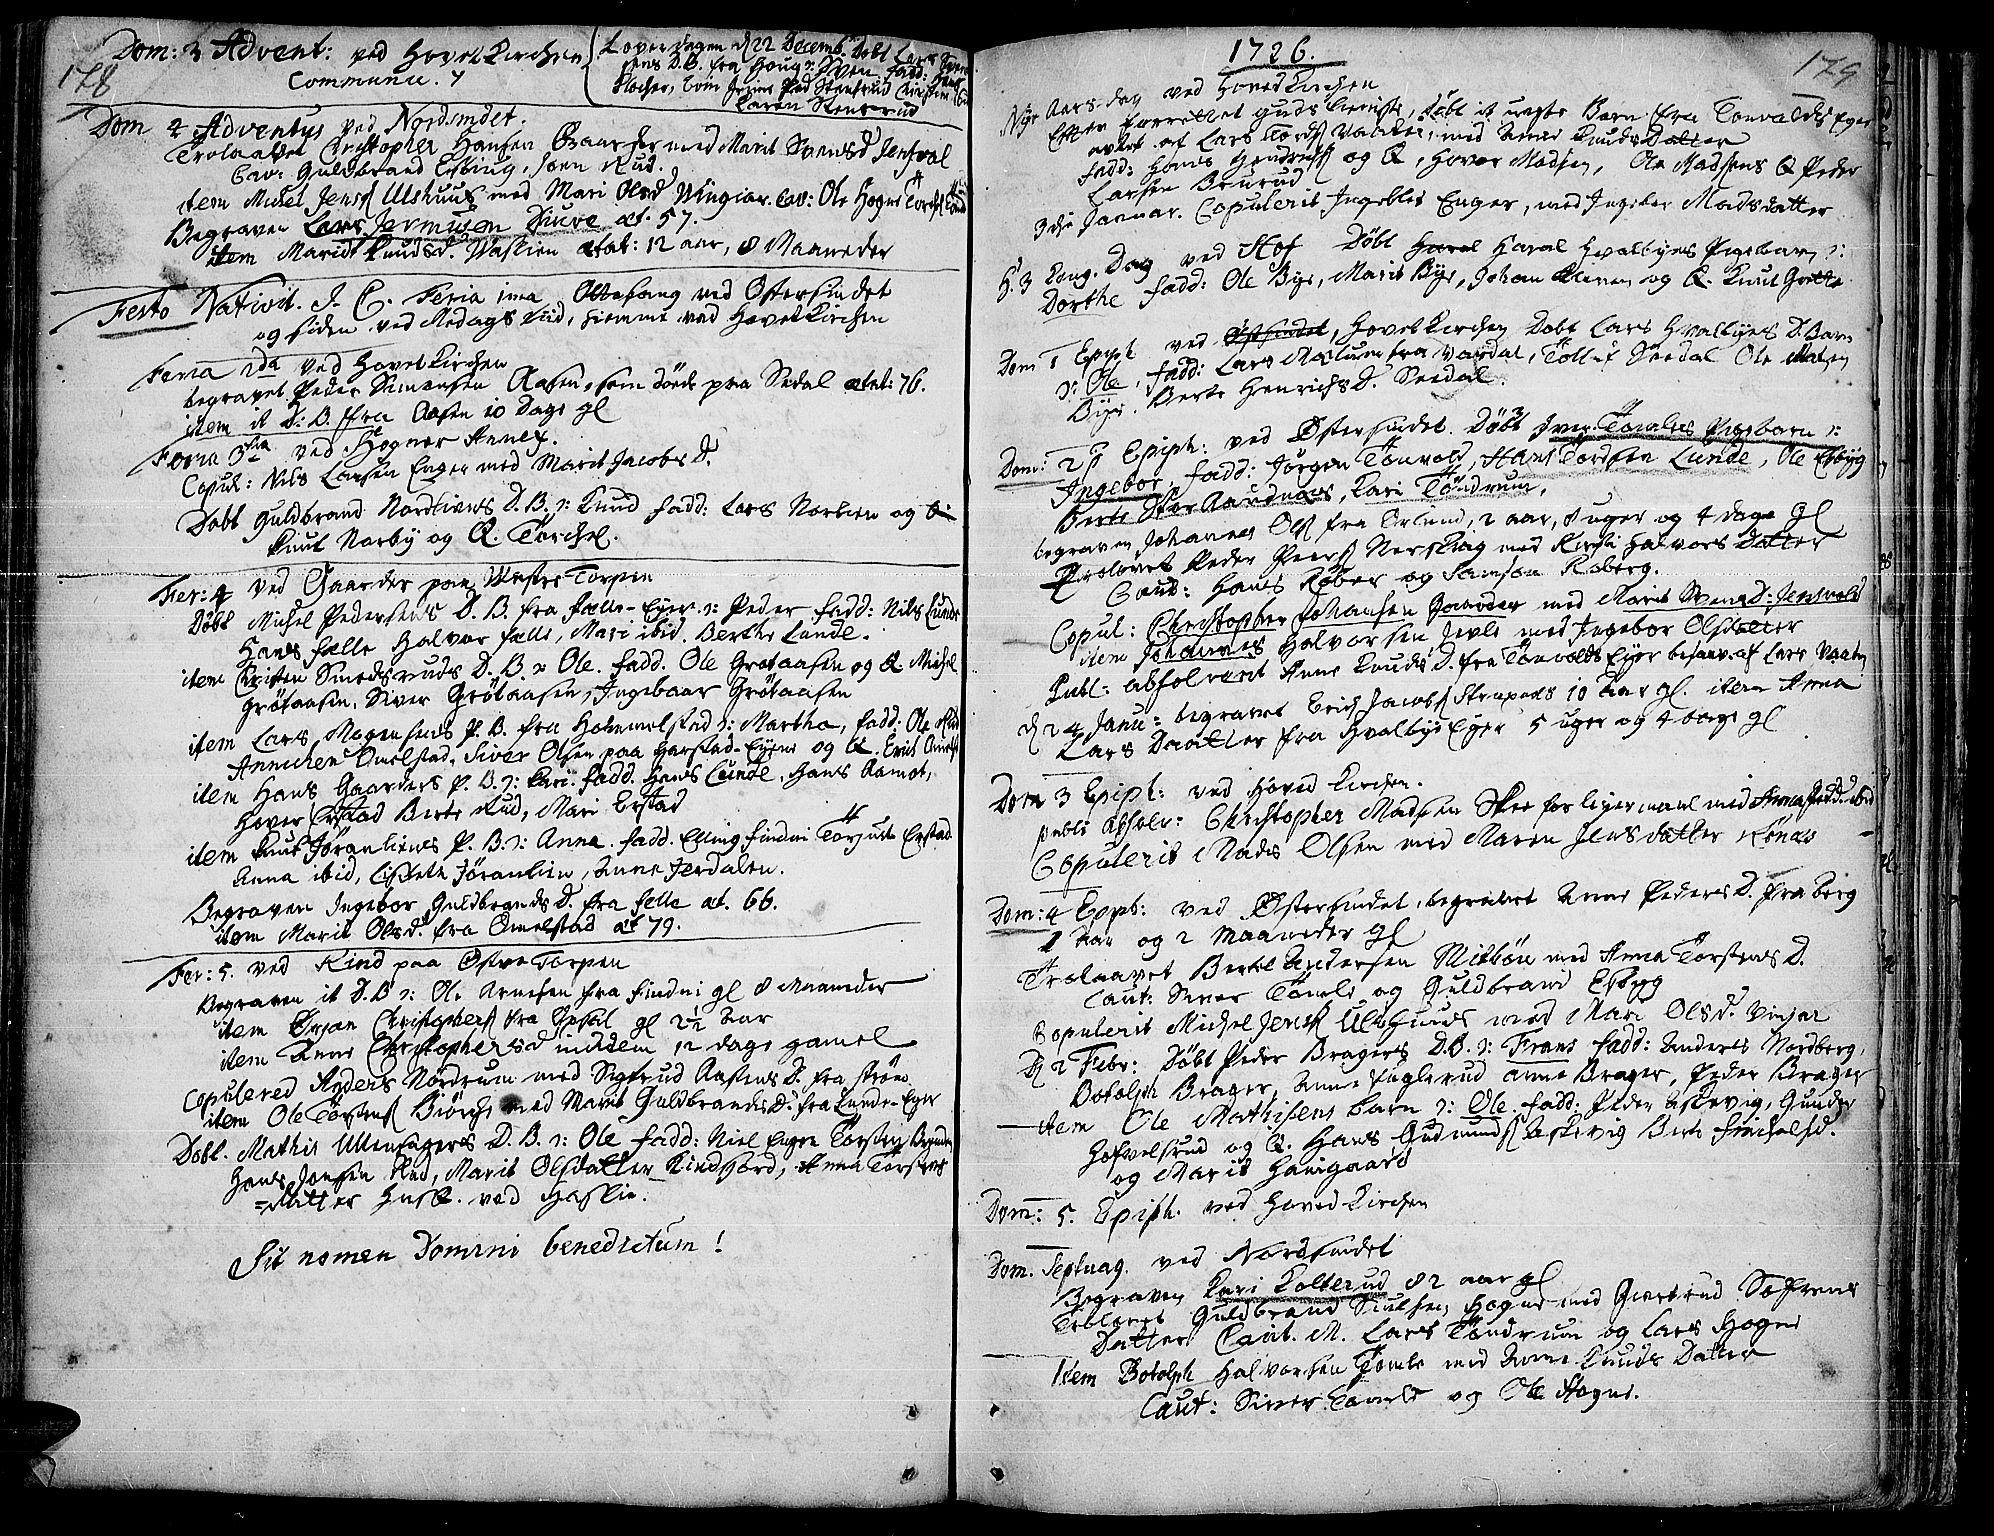 SAH, Land prestekontor, Ministerialbok nr. 1, 1708-1732, s. 178-179